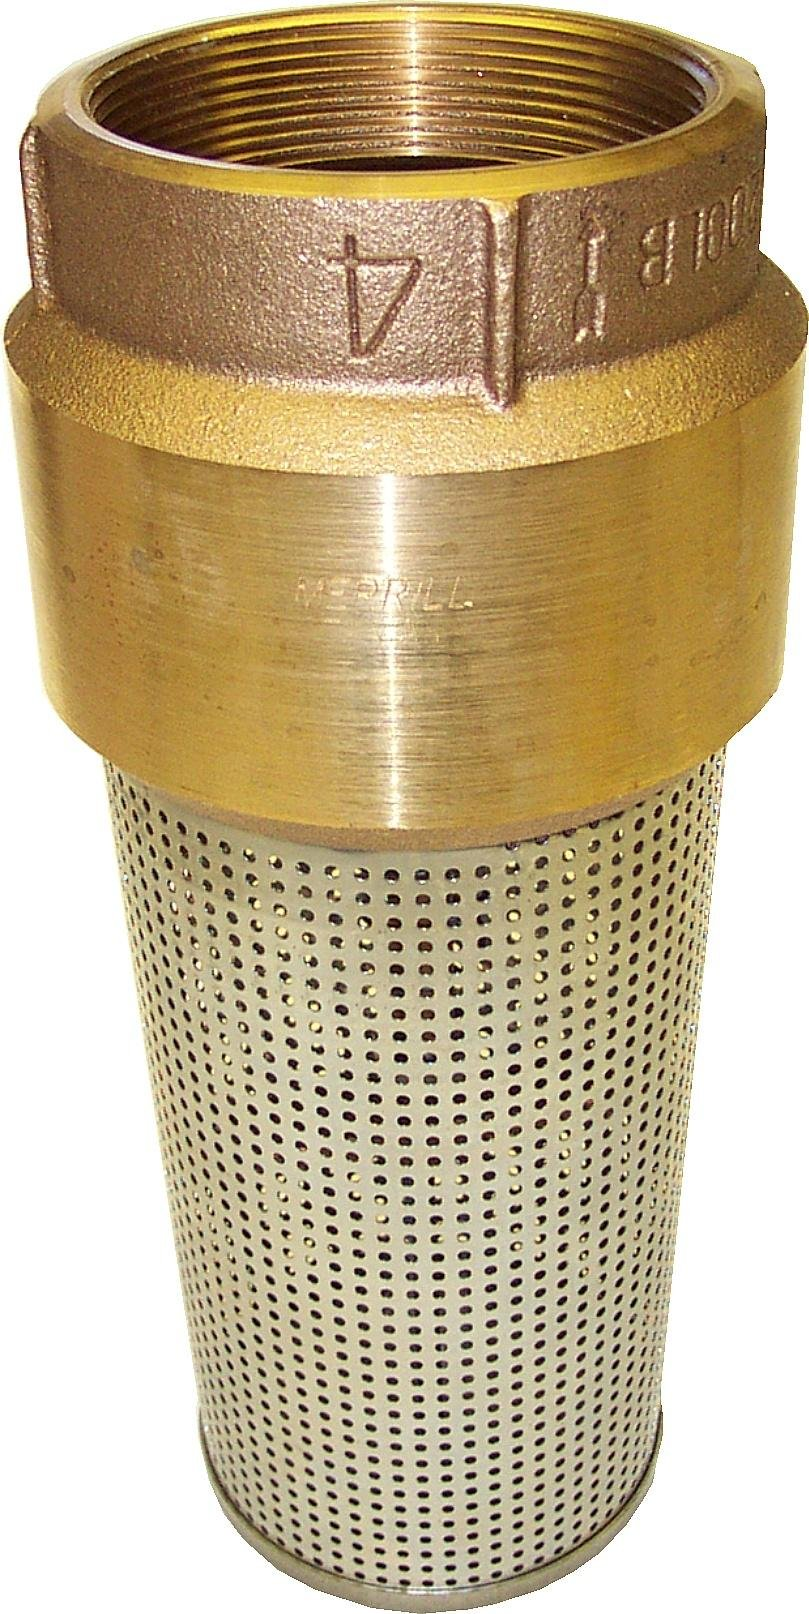 Merrill MFG 039-FV400 Red Brass Foot Valve, Series 810, 4'' Pipe, 1-15/16'' Stainless Steel Strainer, 4''